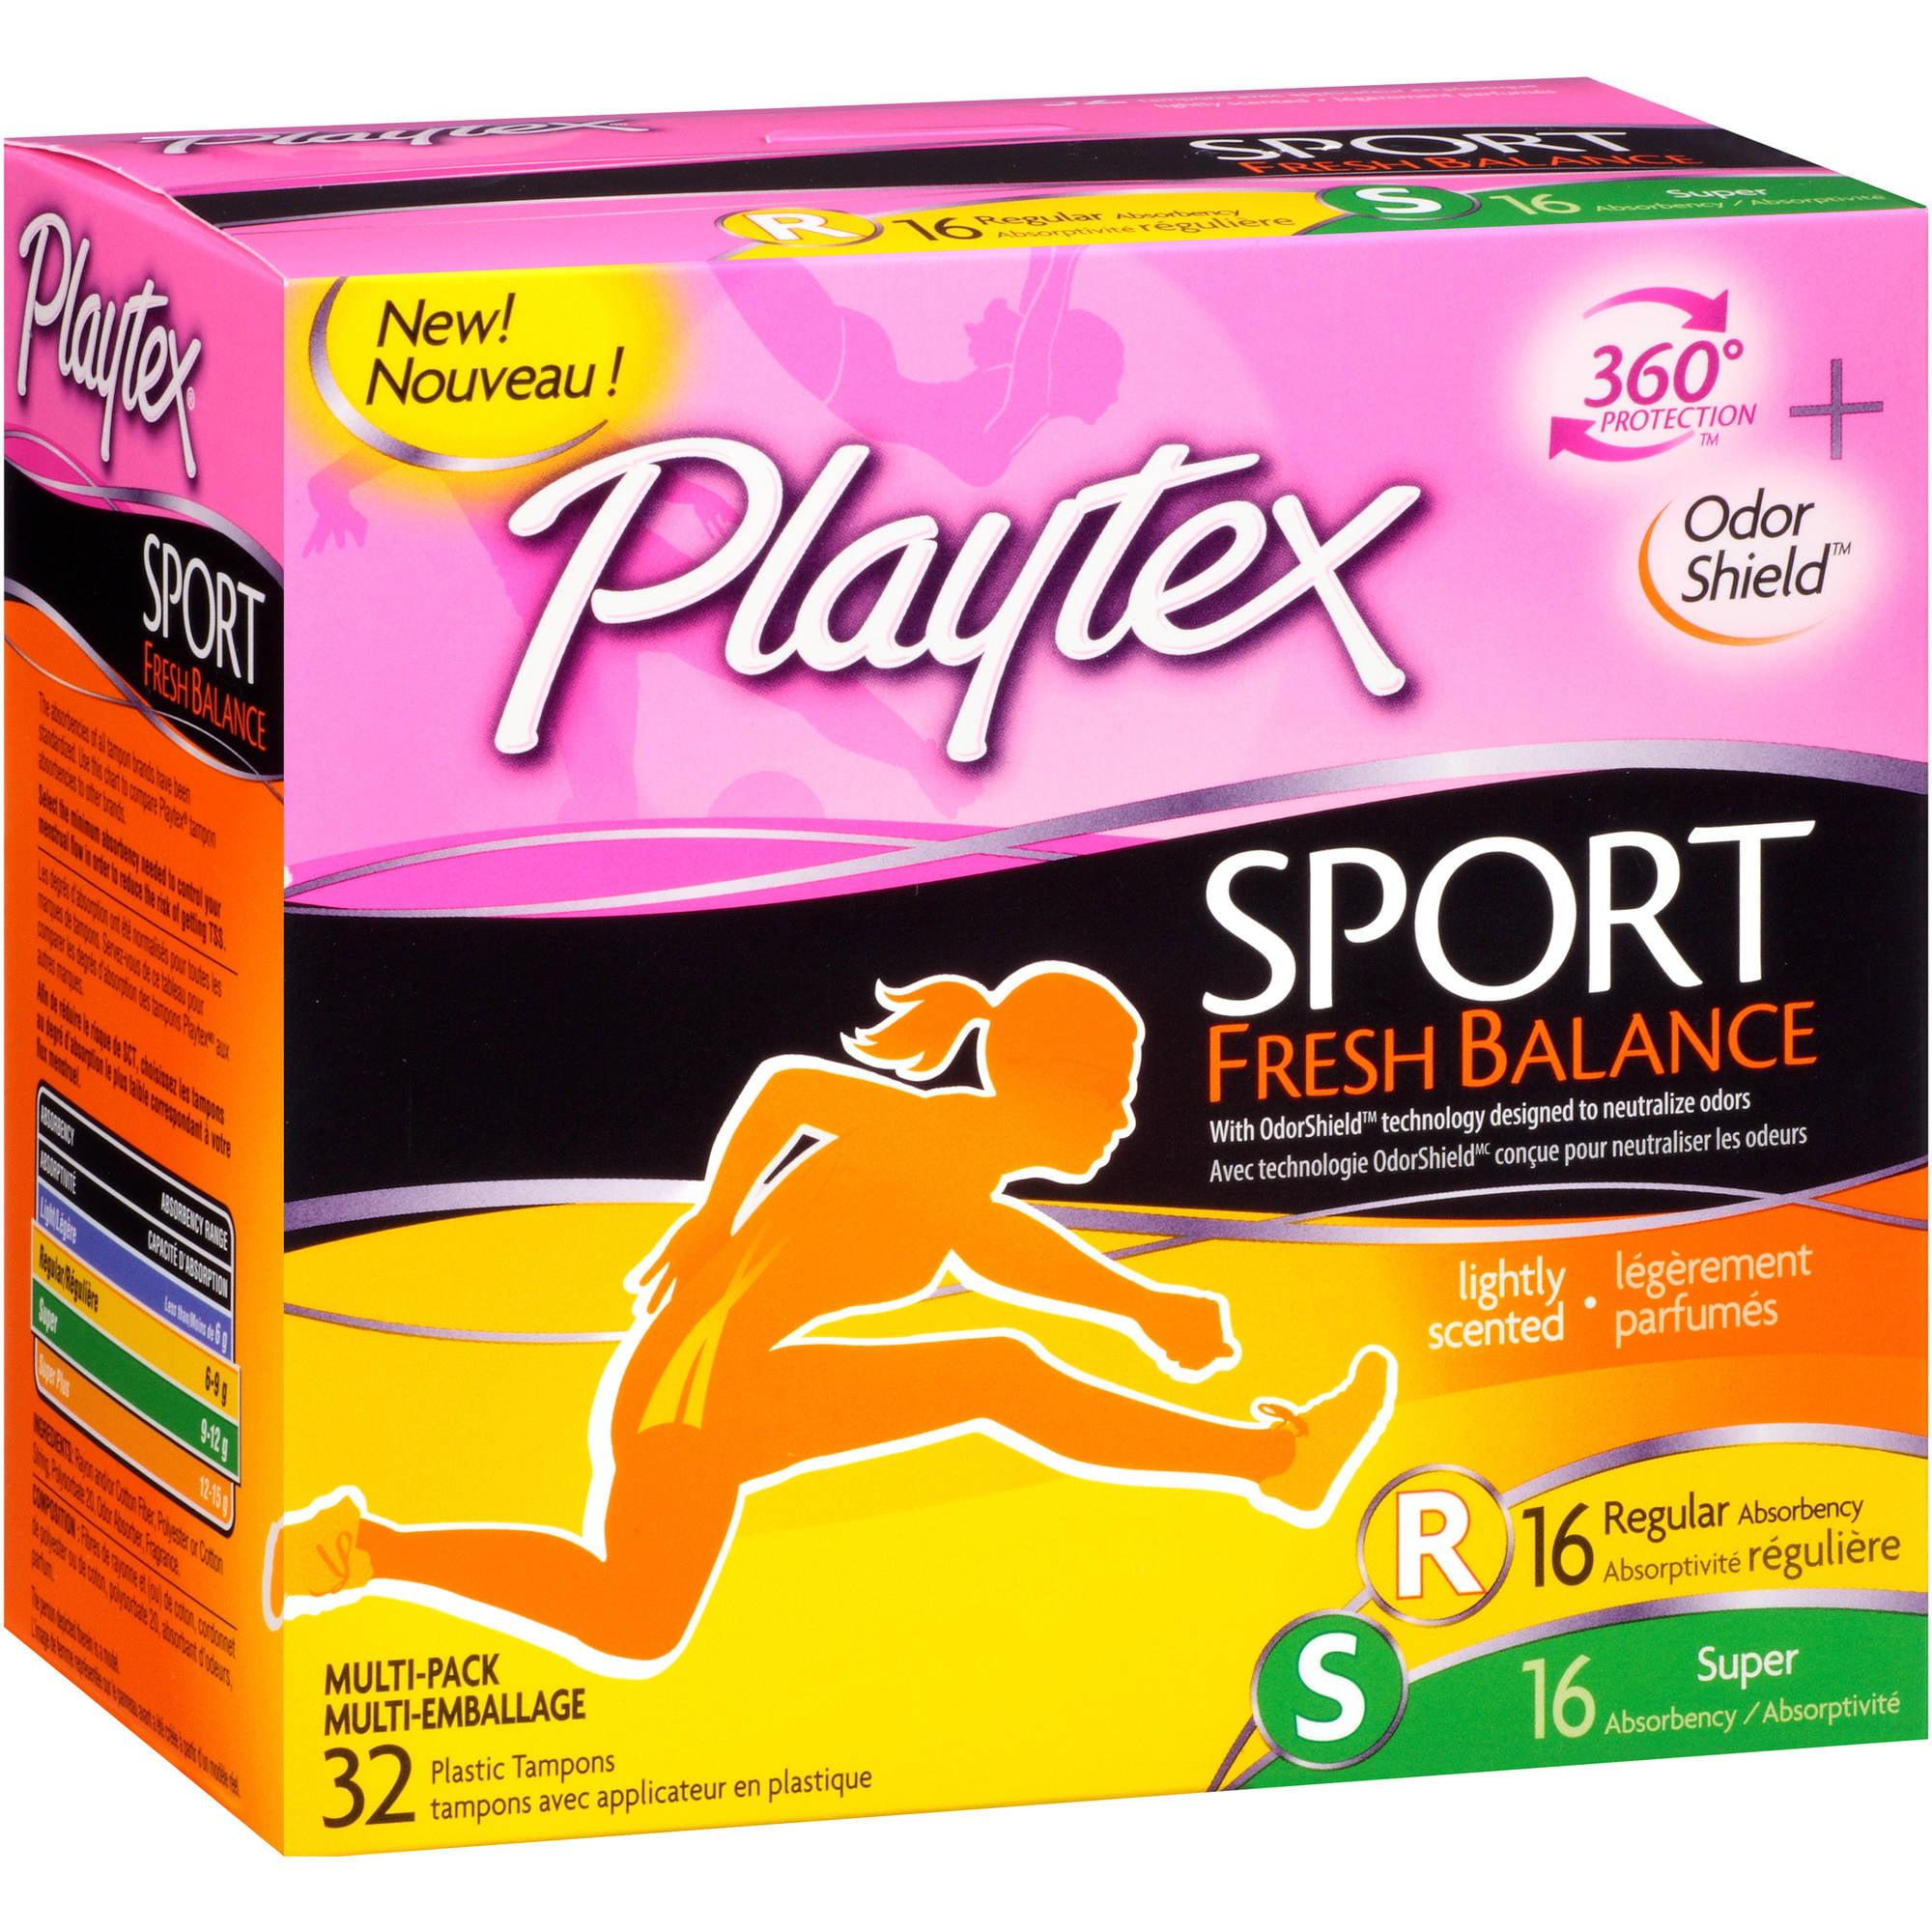 Playtex Sport Fresh Balance Multi-Pack Regular & Super Absorbency Plastic Tampons, 32 count